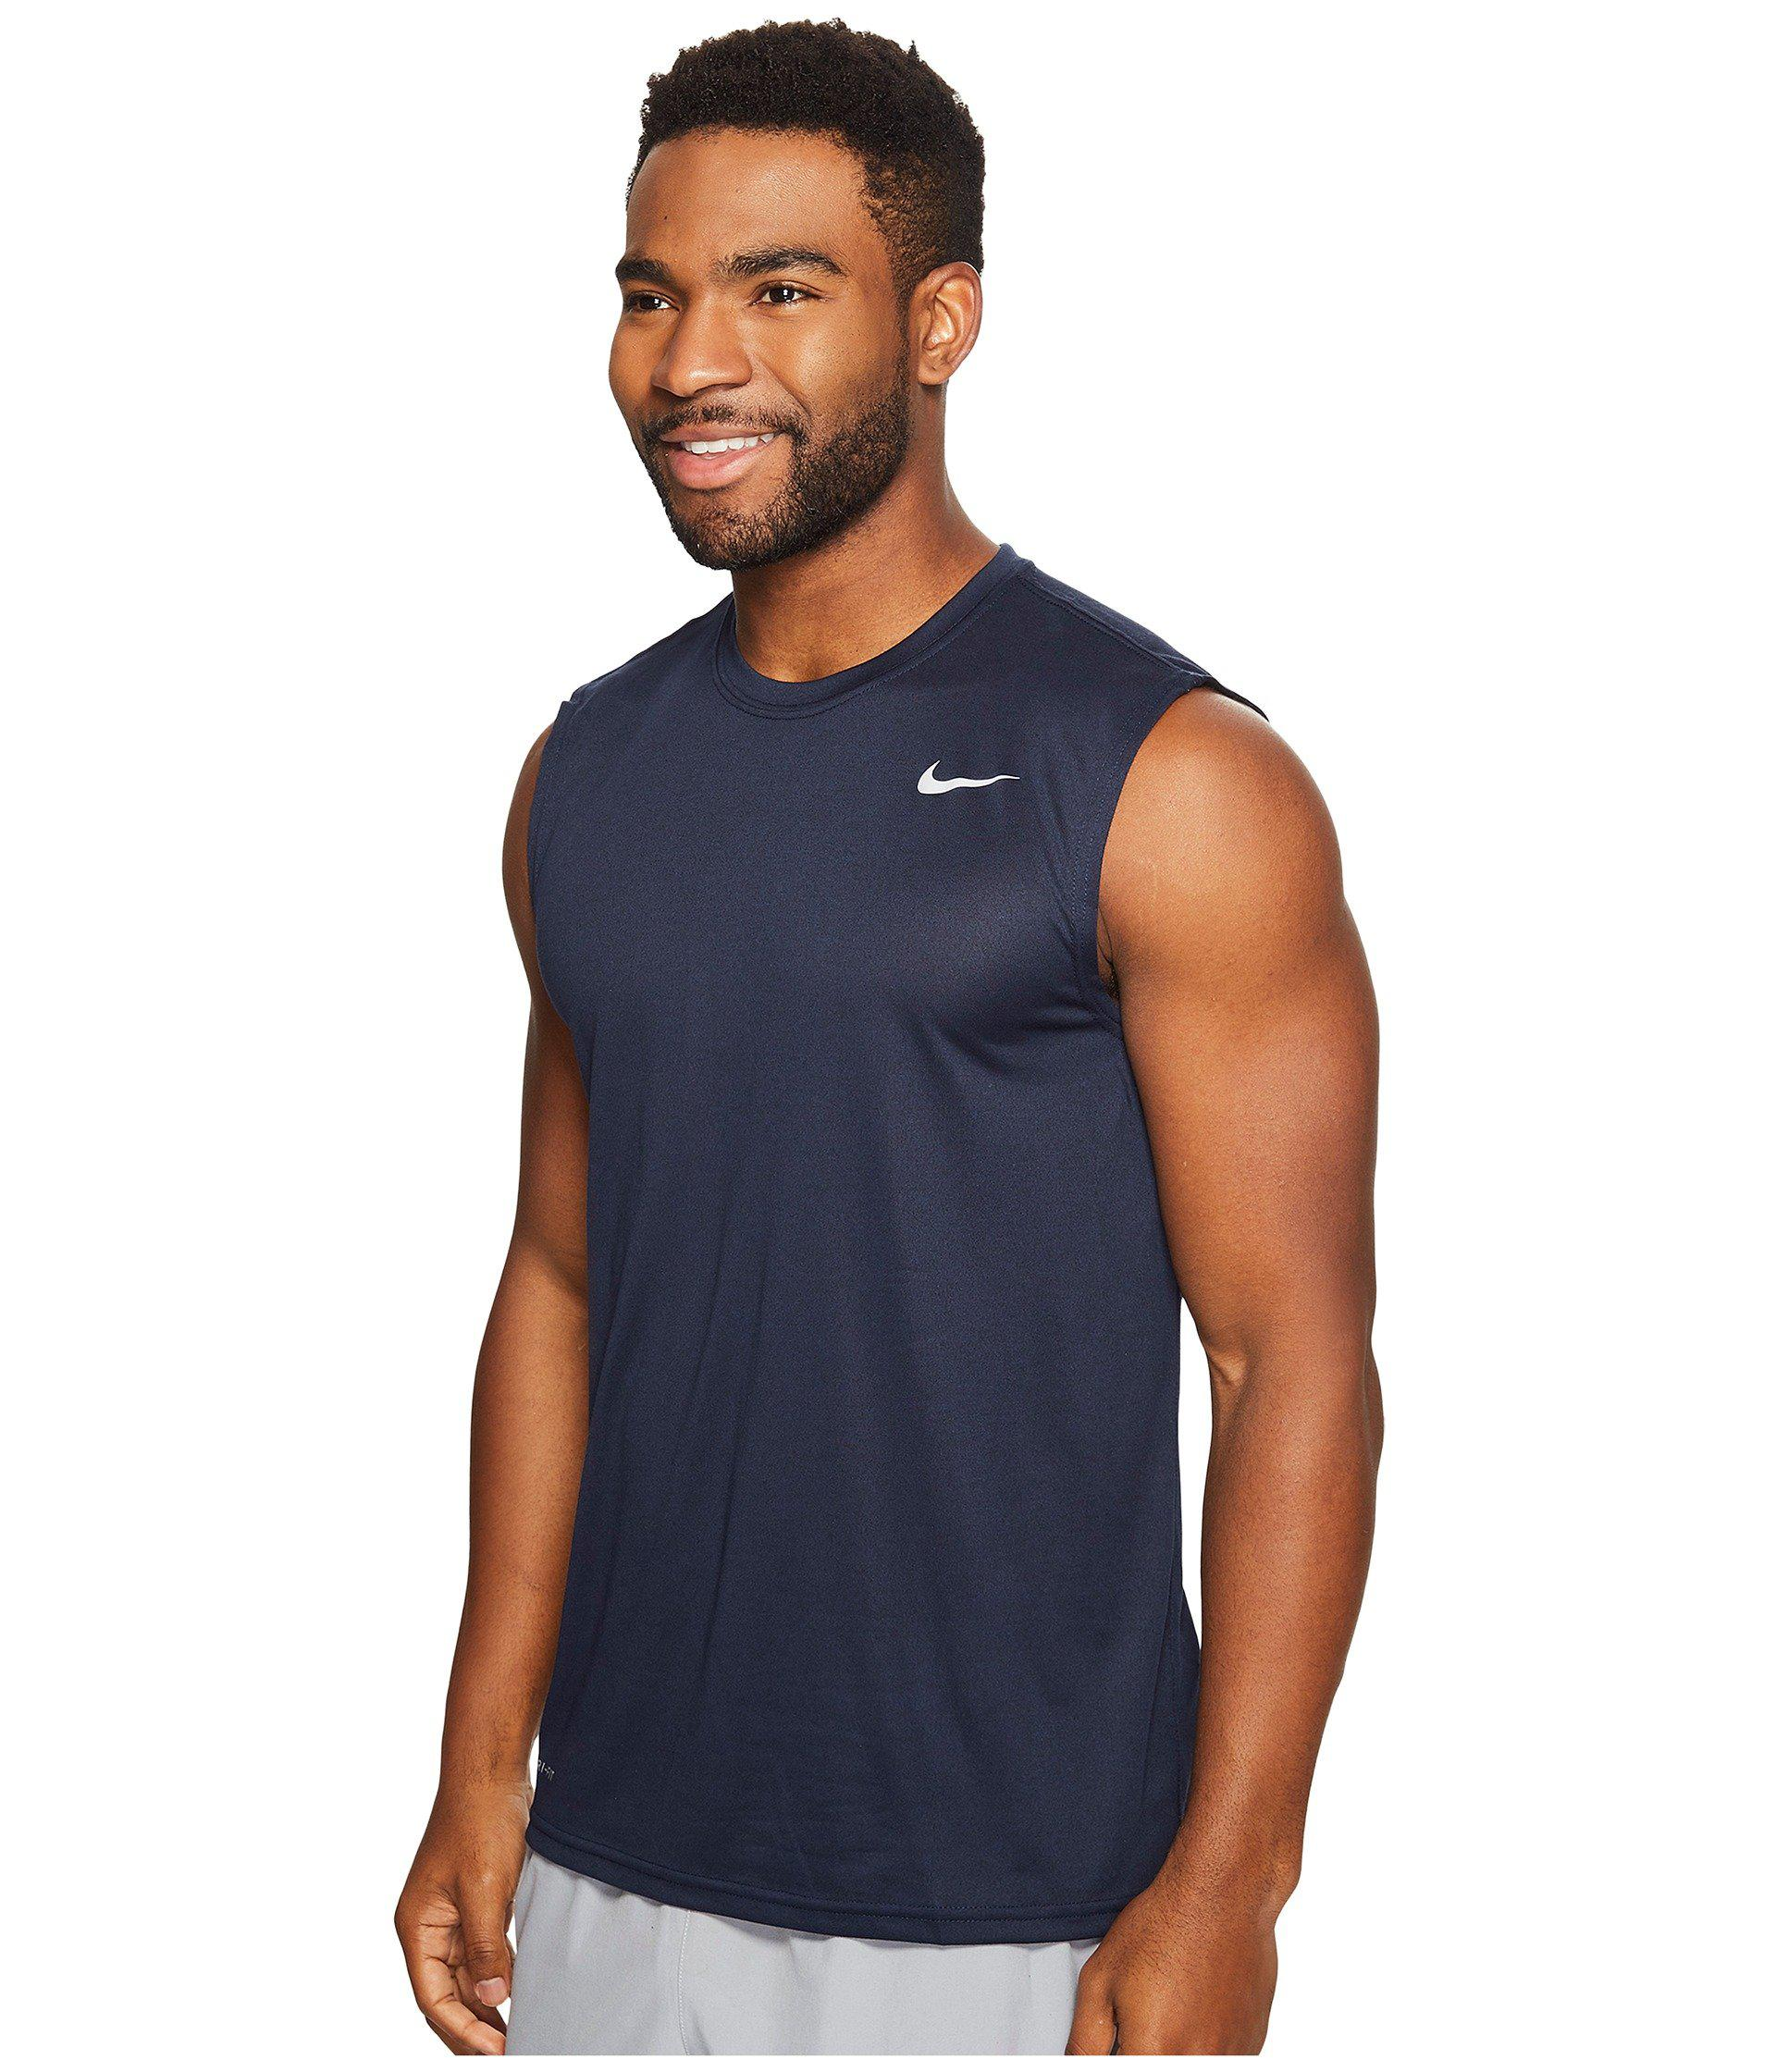 3627f81d1 Nike Dri Fittm Legend Sleeveless Training Shirt - DREAMWORKS